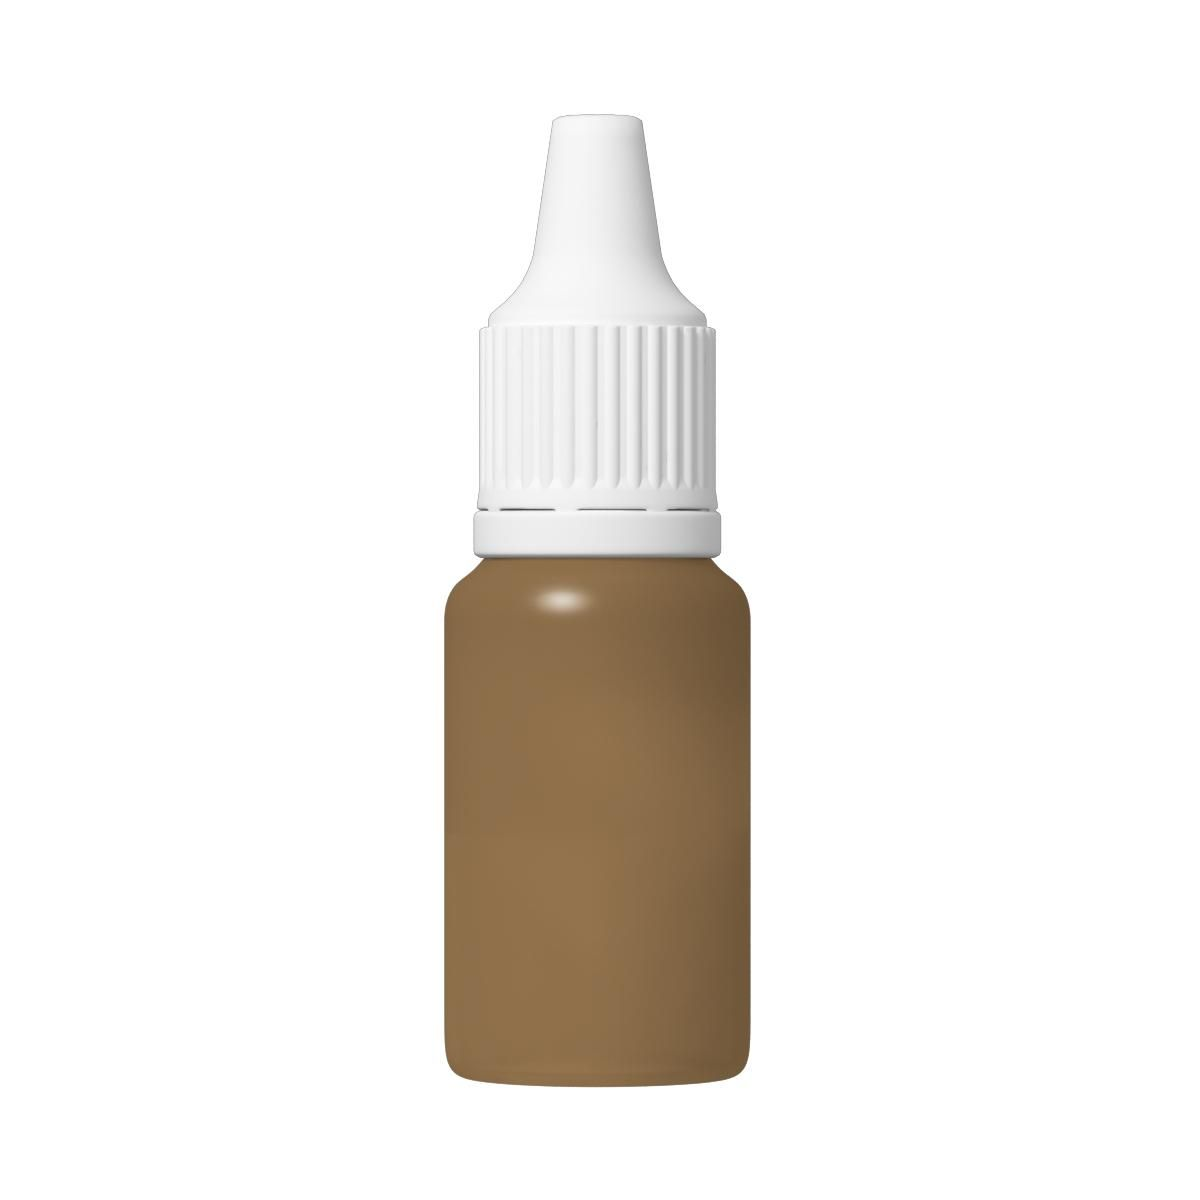 TFC Silikonfarbe Farbpaste Silikon Kautschuk RAL1036 gold pearl